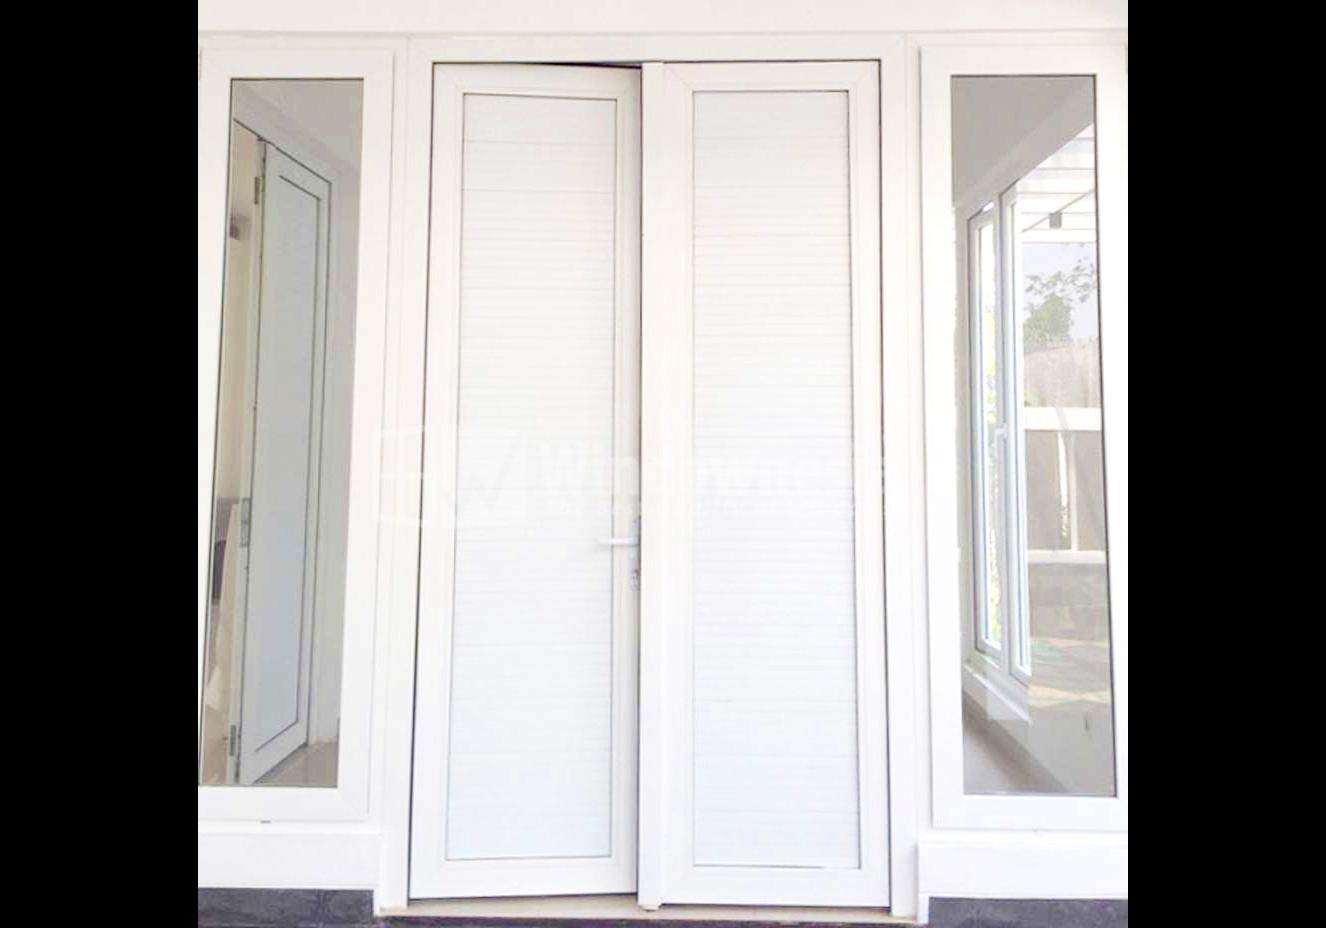 Pintu Panel UPVC, Pintu Geser Kamar Mandi, Pintu Panel